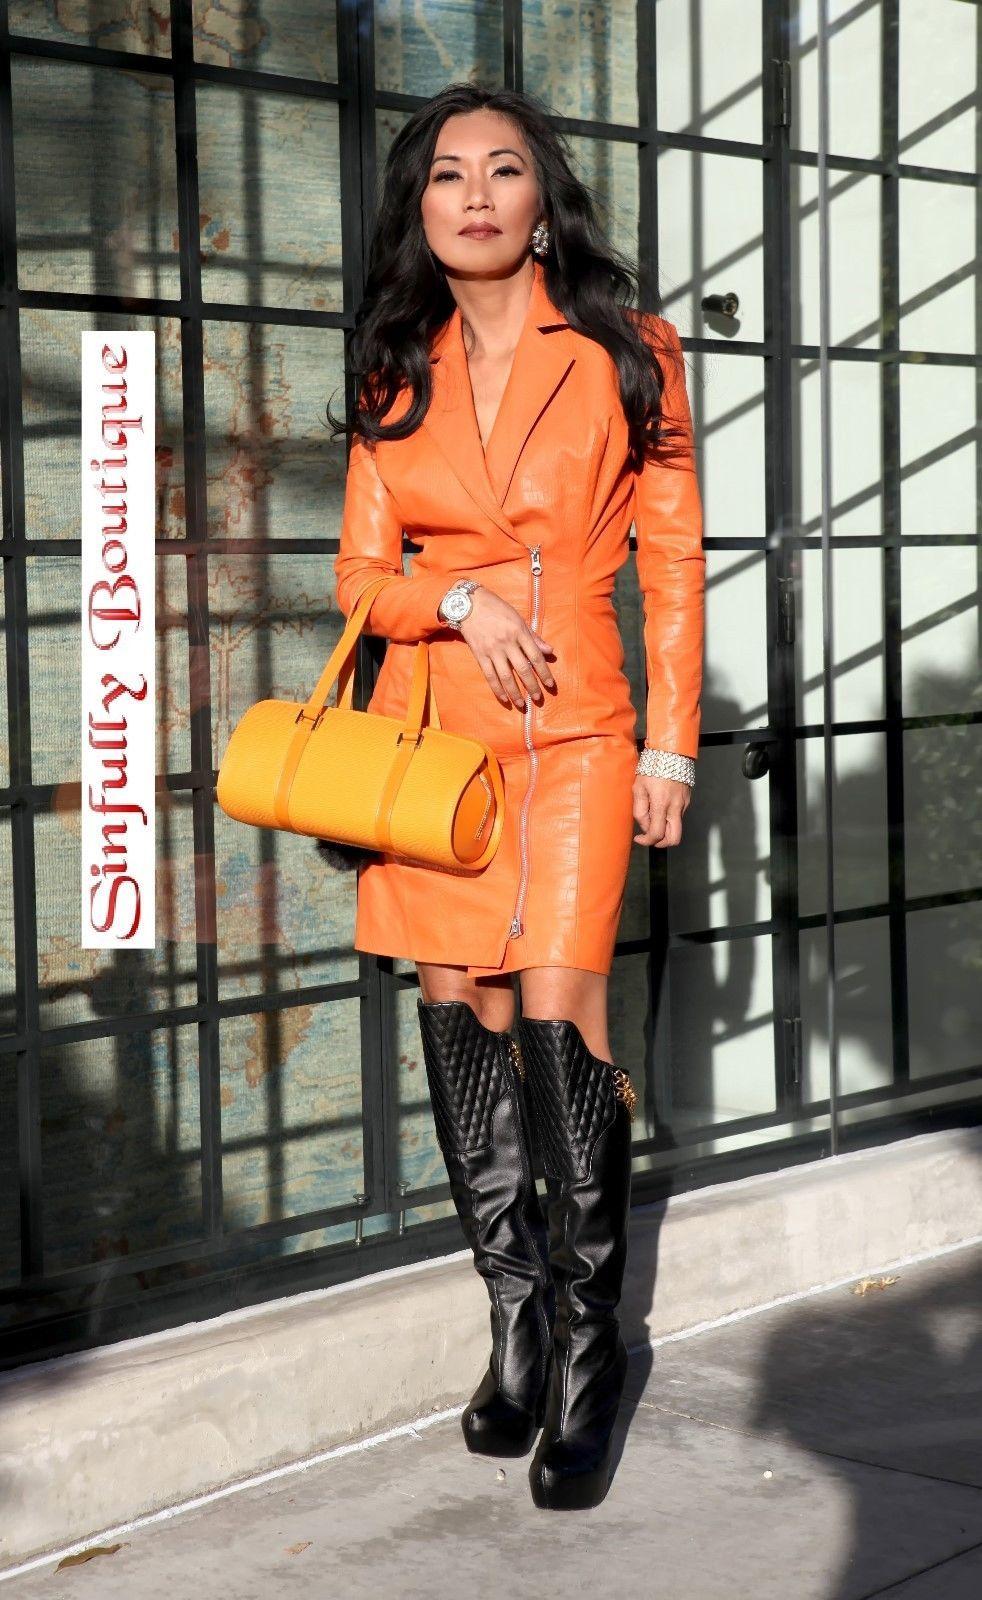 Sexy Lederkleid¦ Lederdress¦ Partykleid¦ Echtleder Kleid¦ Leather ...